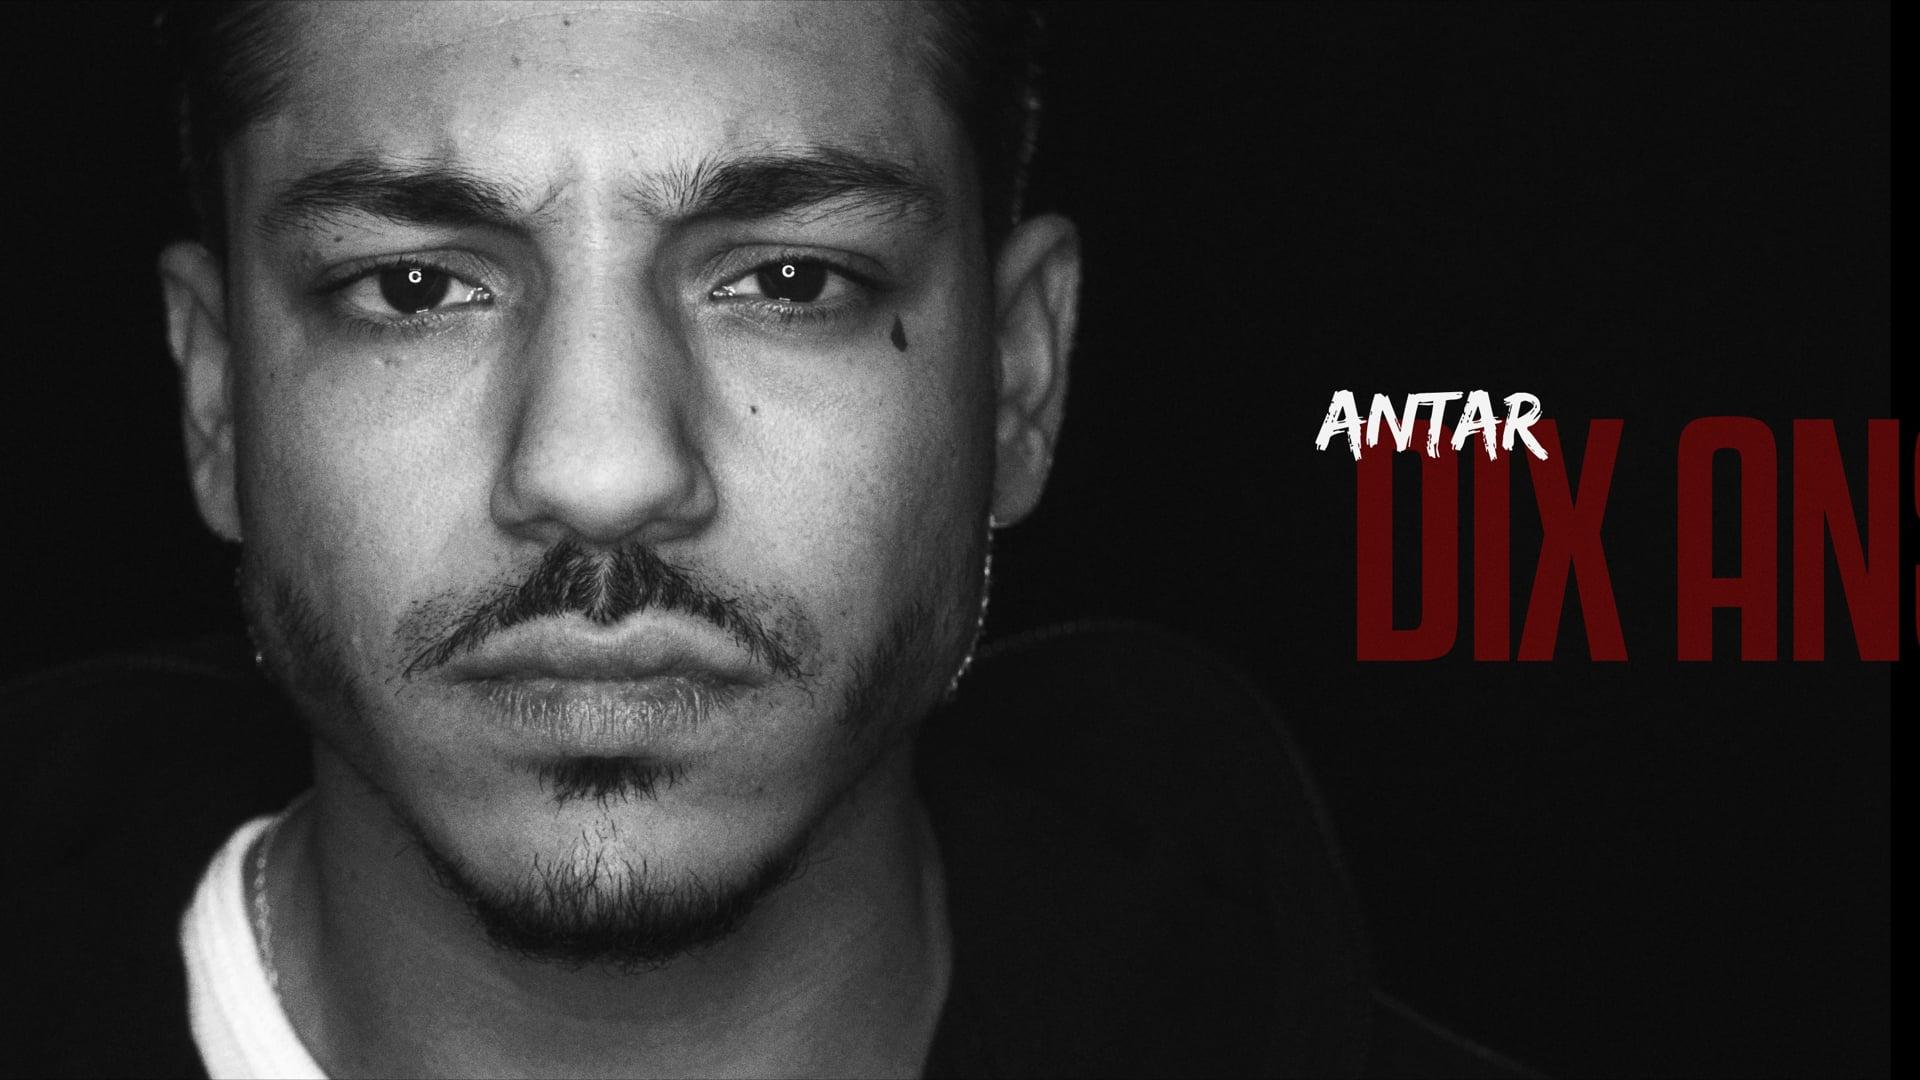 ANTAR - DIX ANS